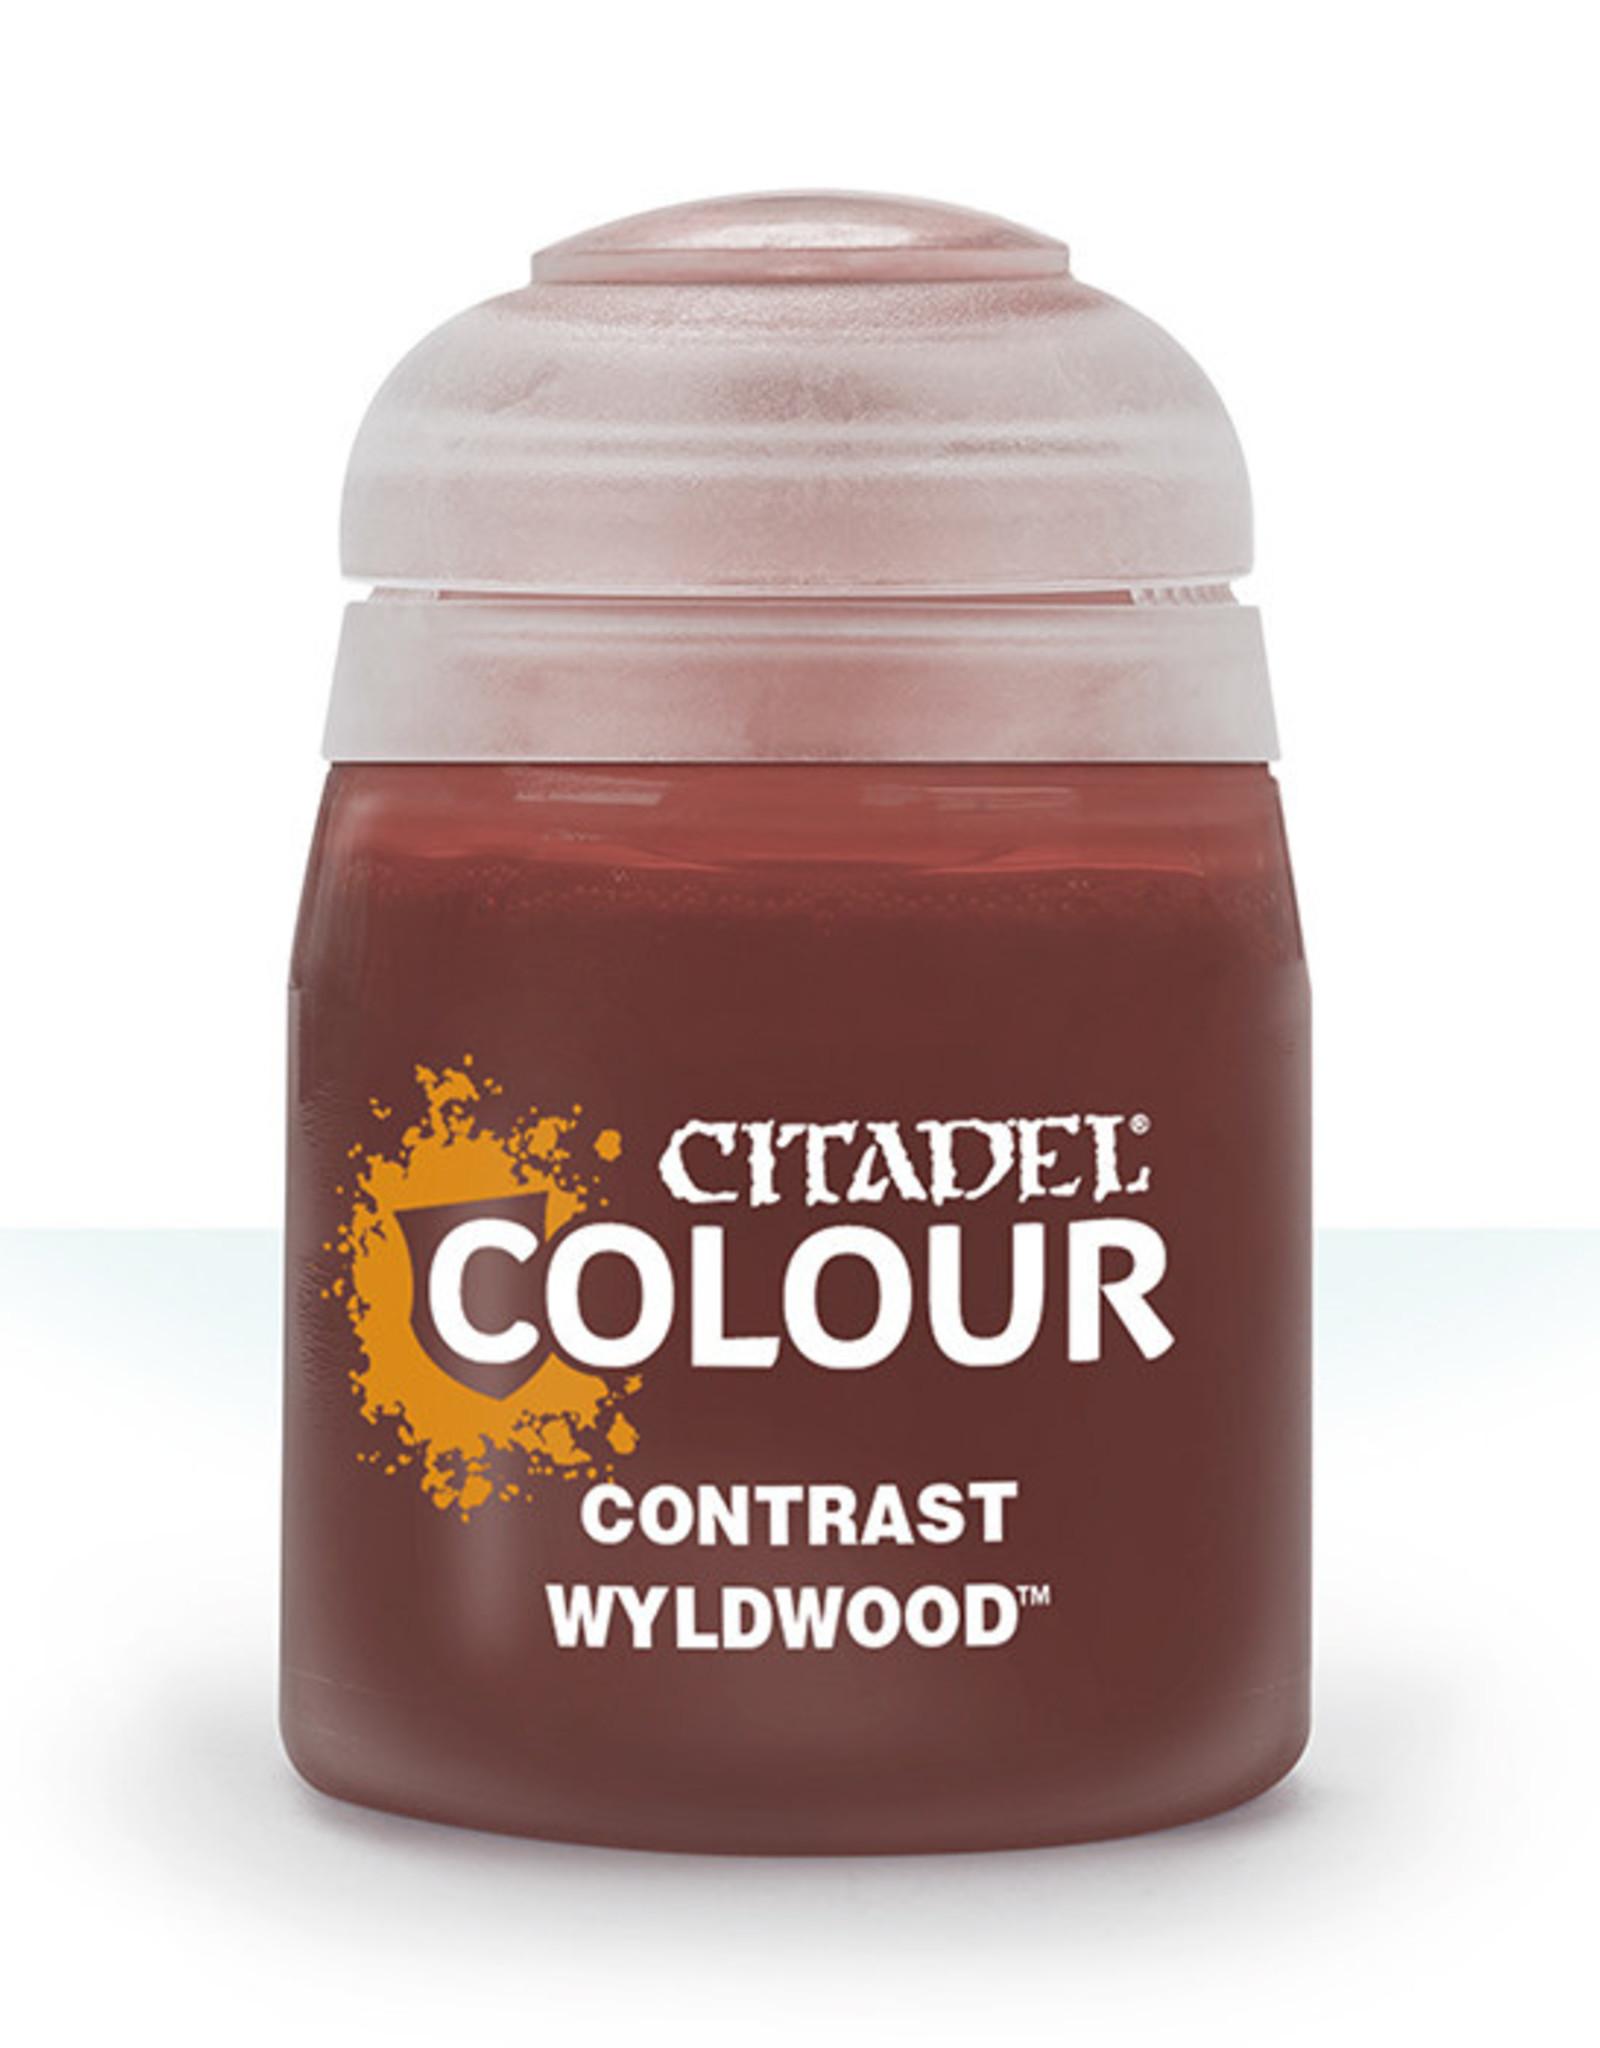 Citadel Citadel Colour: Contrast - Wyldwood